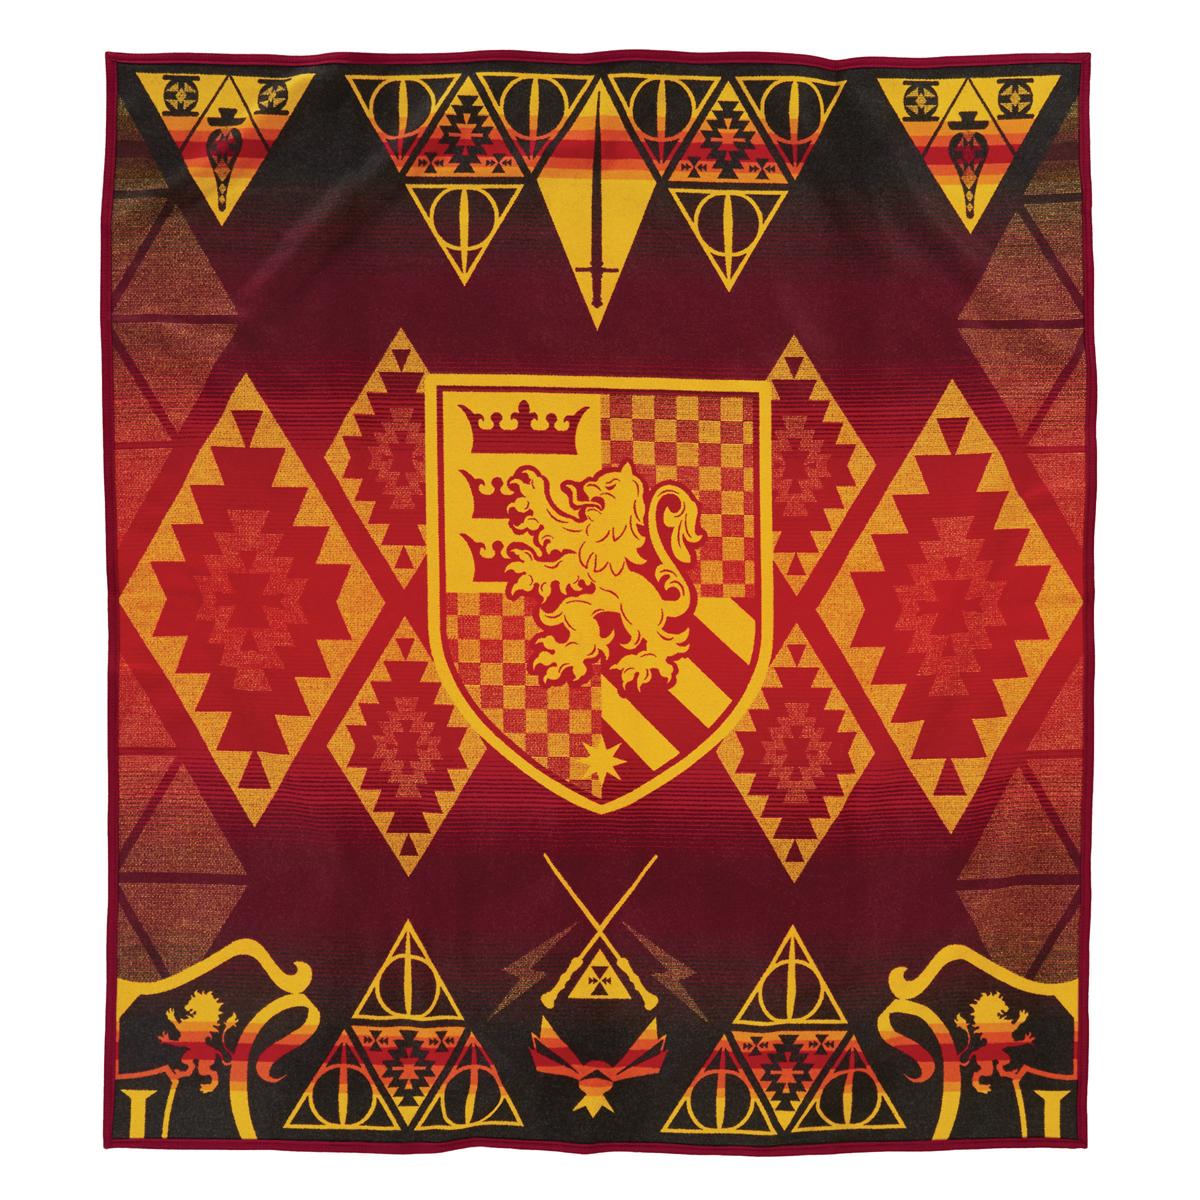 The Gryffindor blanket by Pendleton